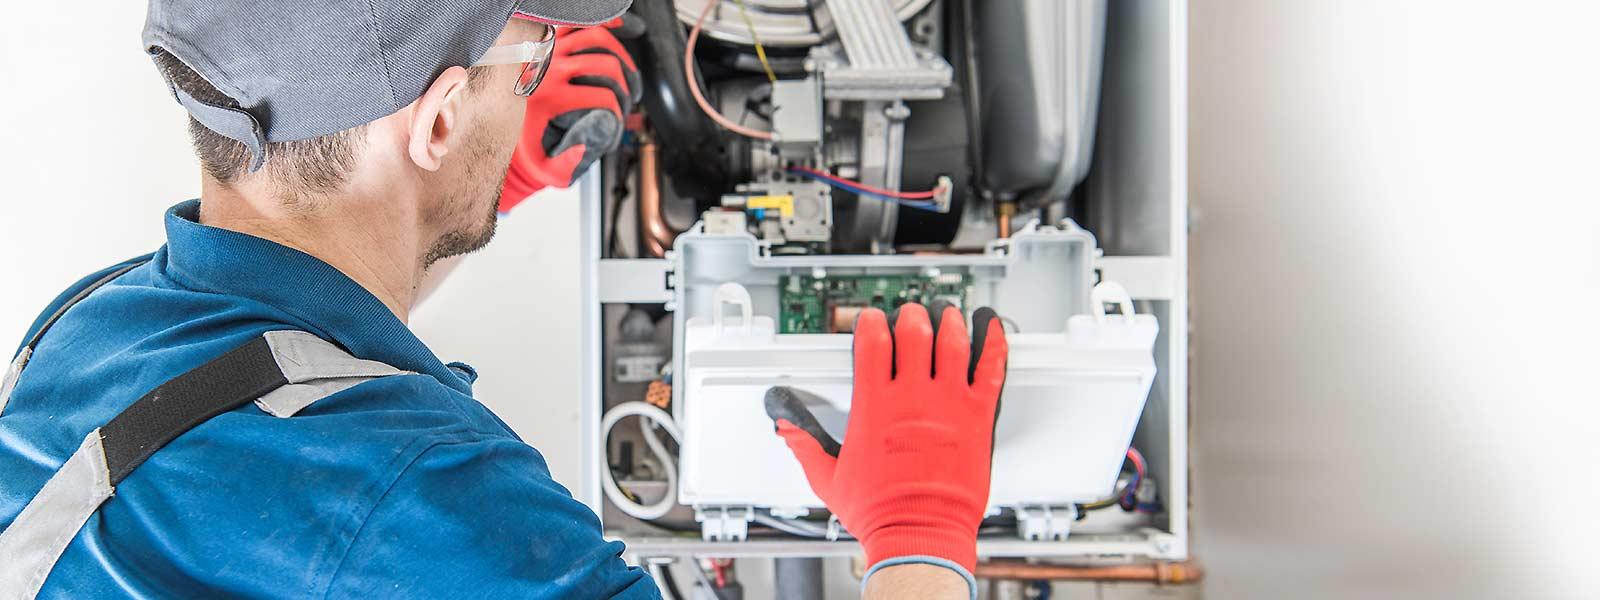 cr termotecnica ricambi caldaie boiler